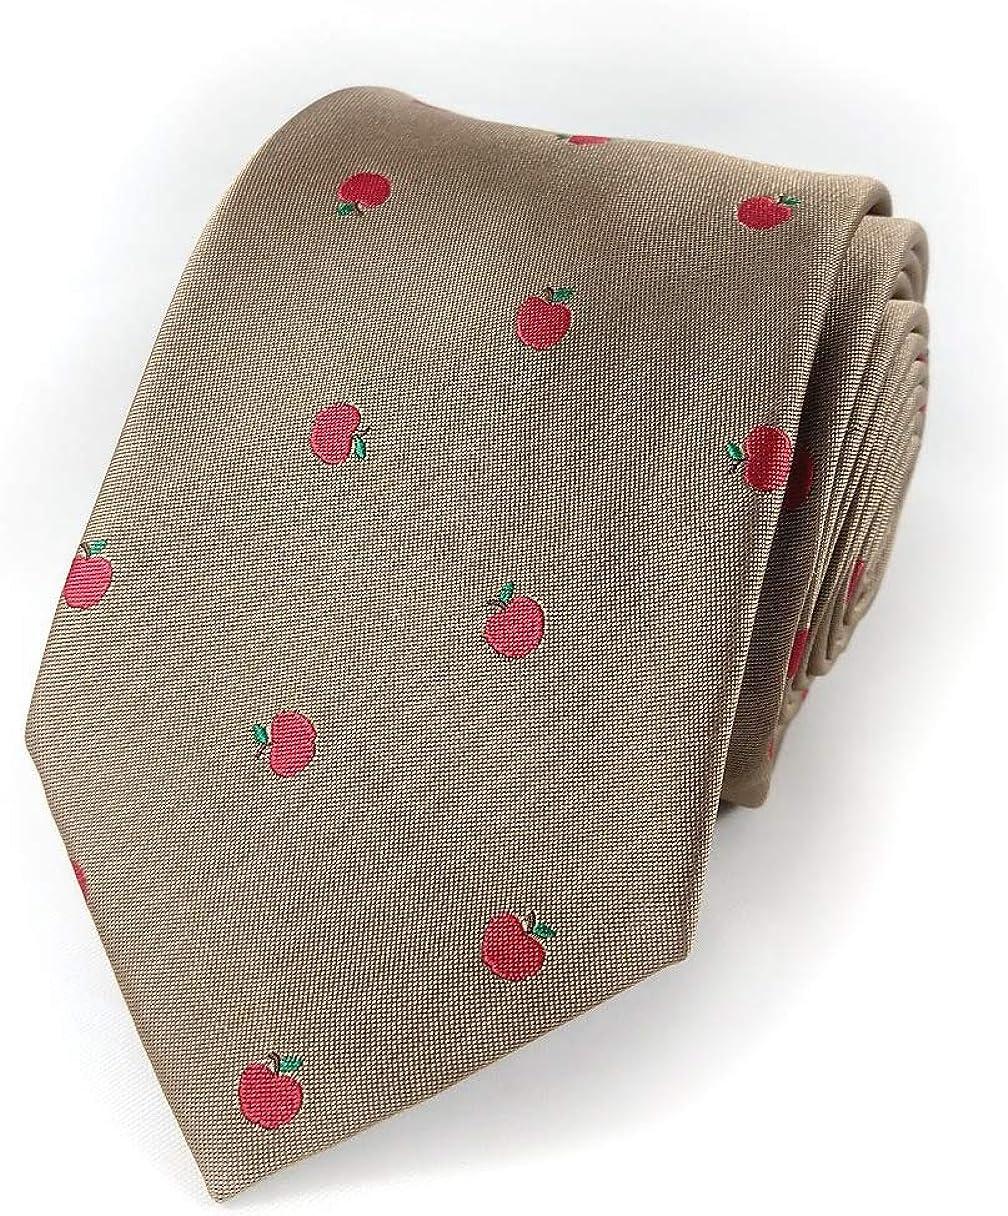 Teacher Necktie - Gift for Teachers - Teacher Gift - Fruit Necktie - Food Necktie